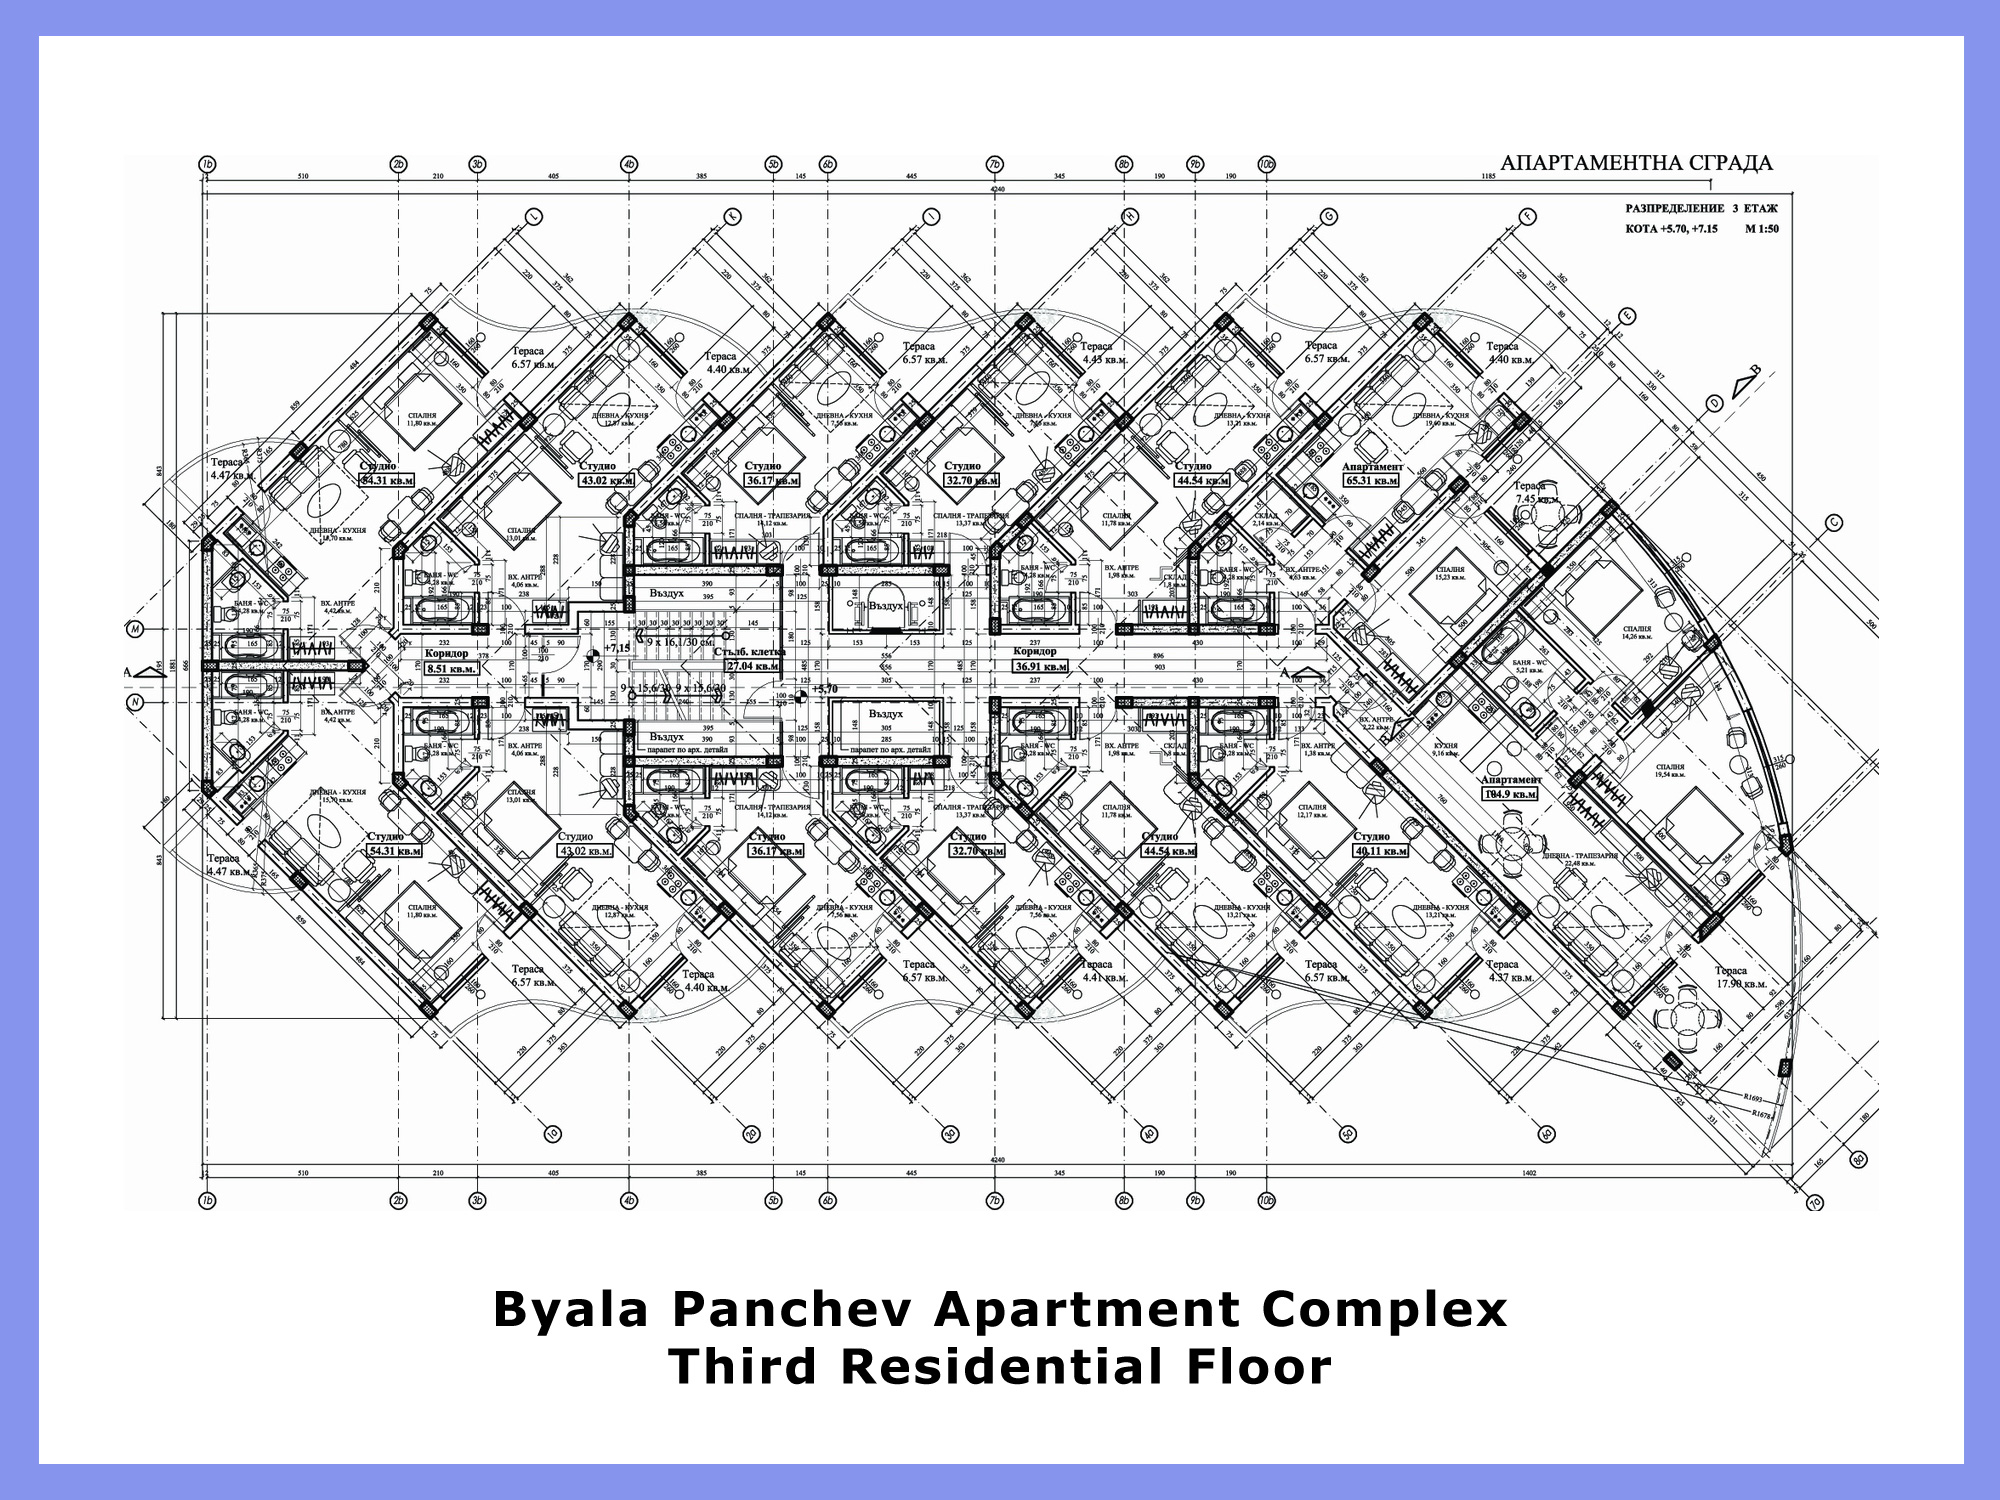 Byala panchev apartment complex for Apartment complex floor plans